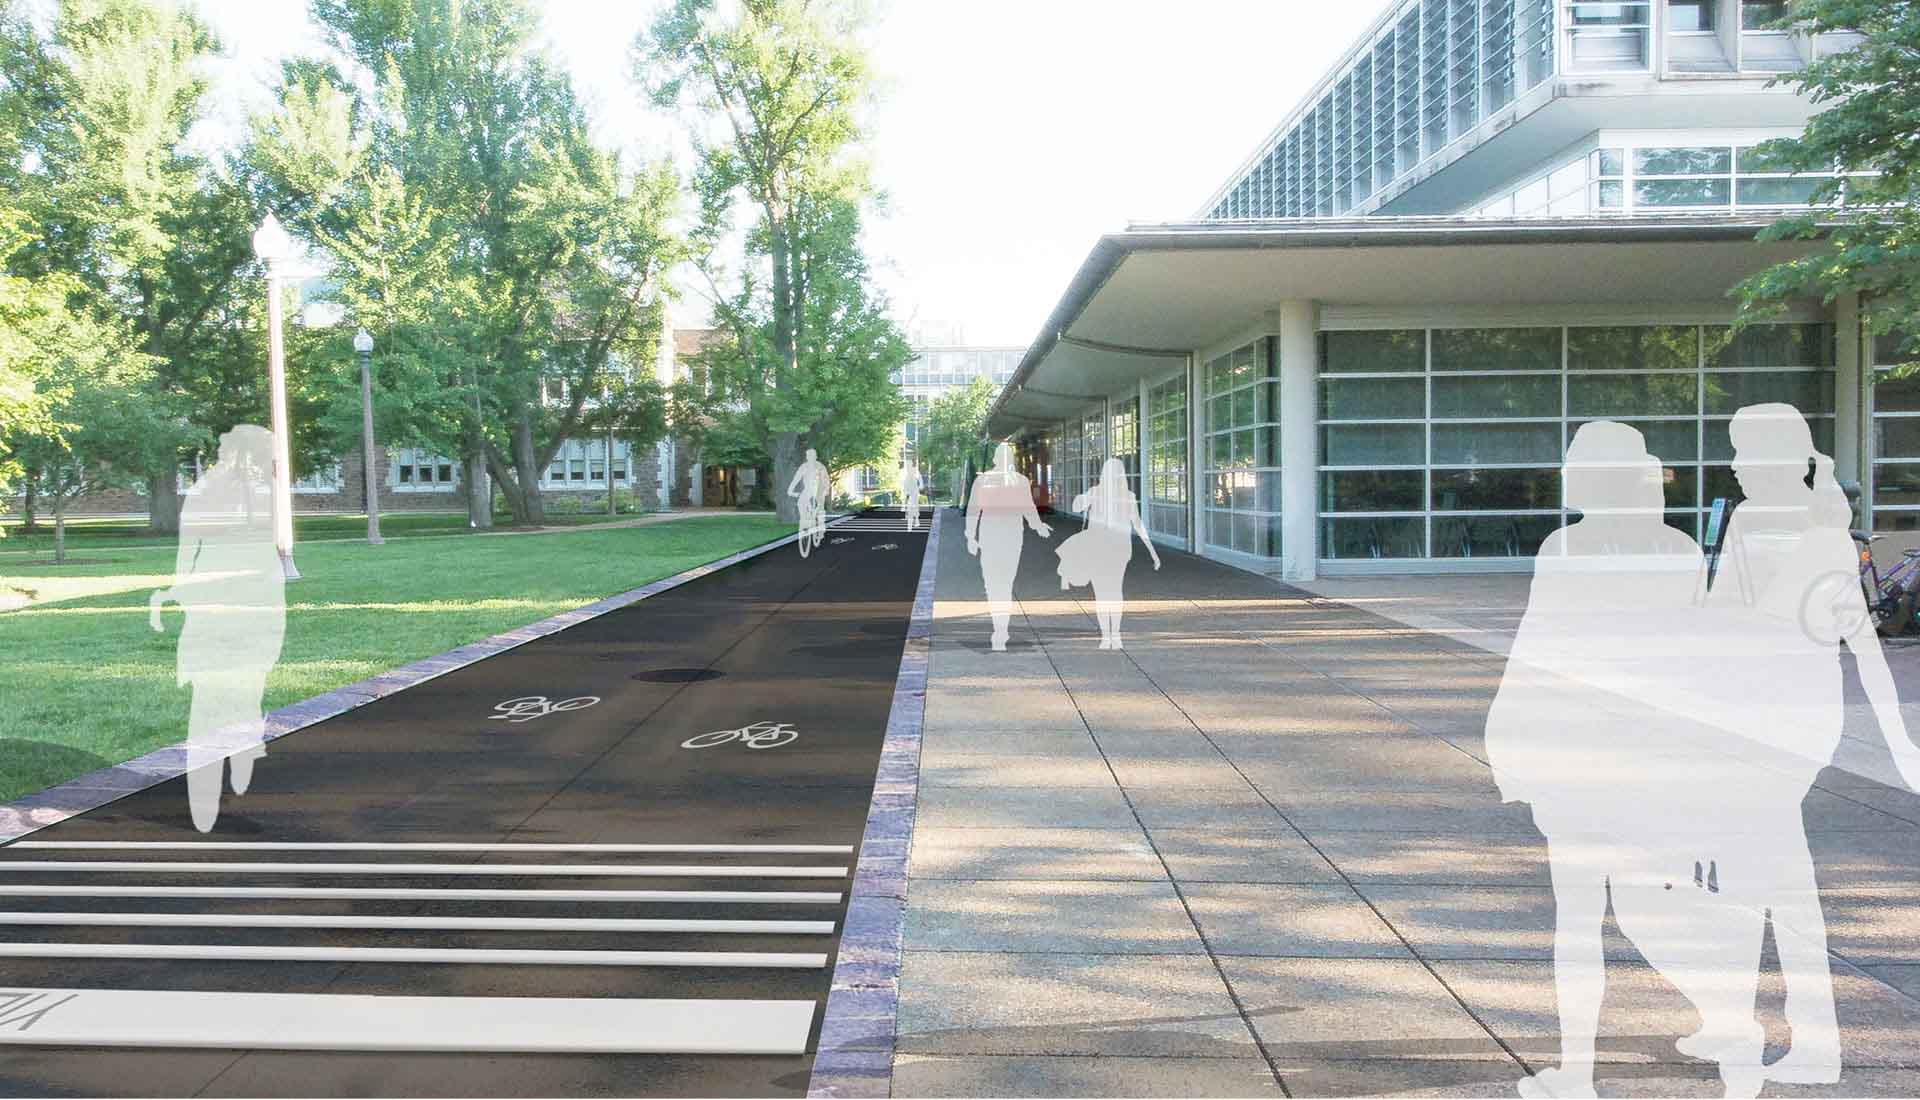 Arbolope Studio | Landscape Architects + Urban Designers | Capital Projects Connector (Washington University in St. Louis)